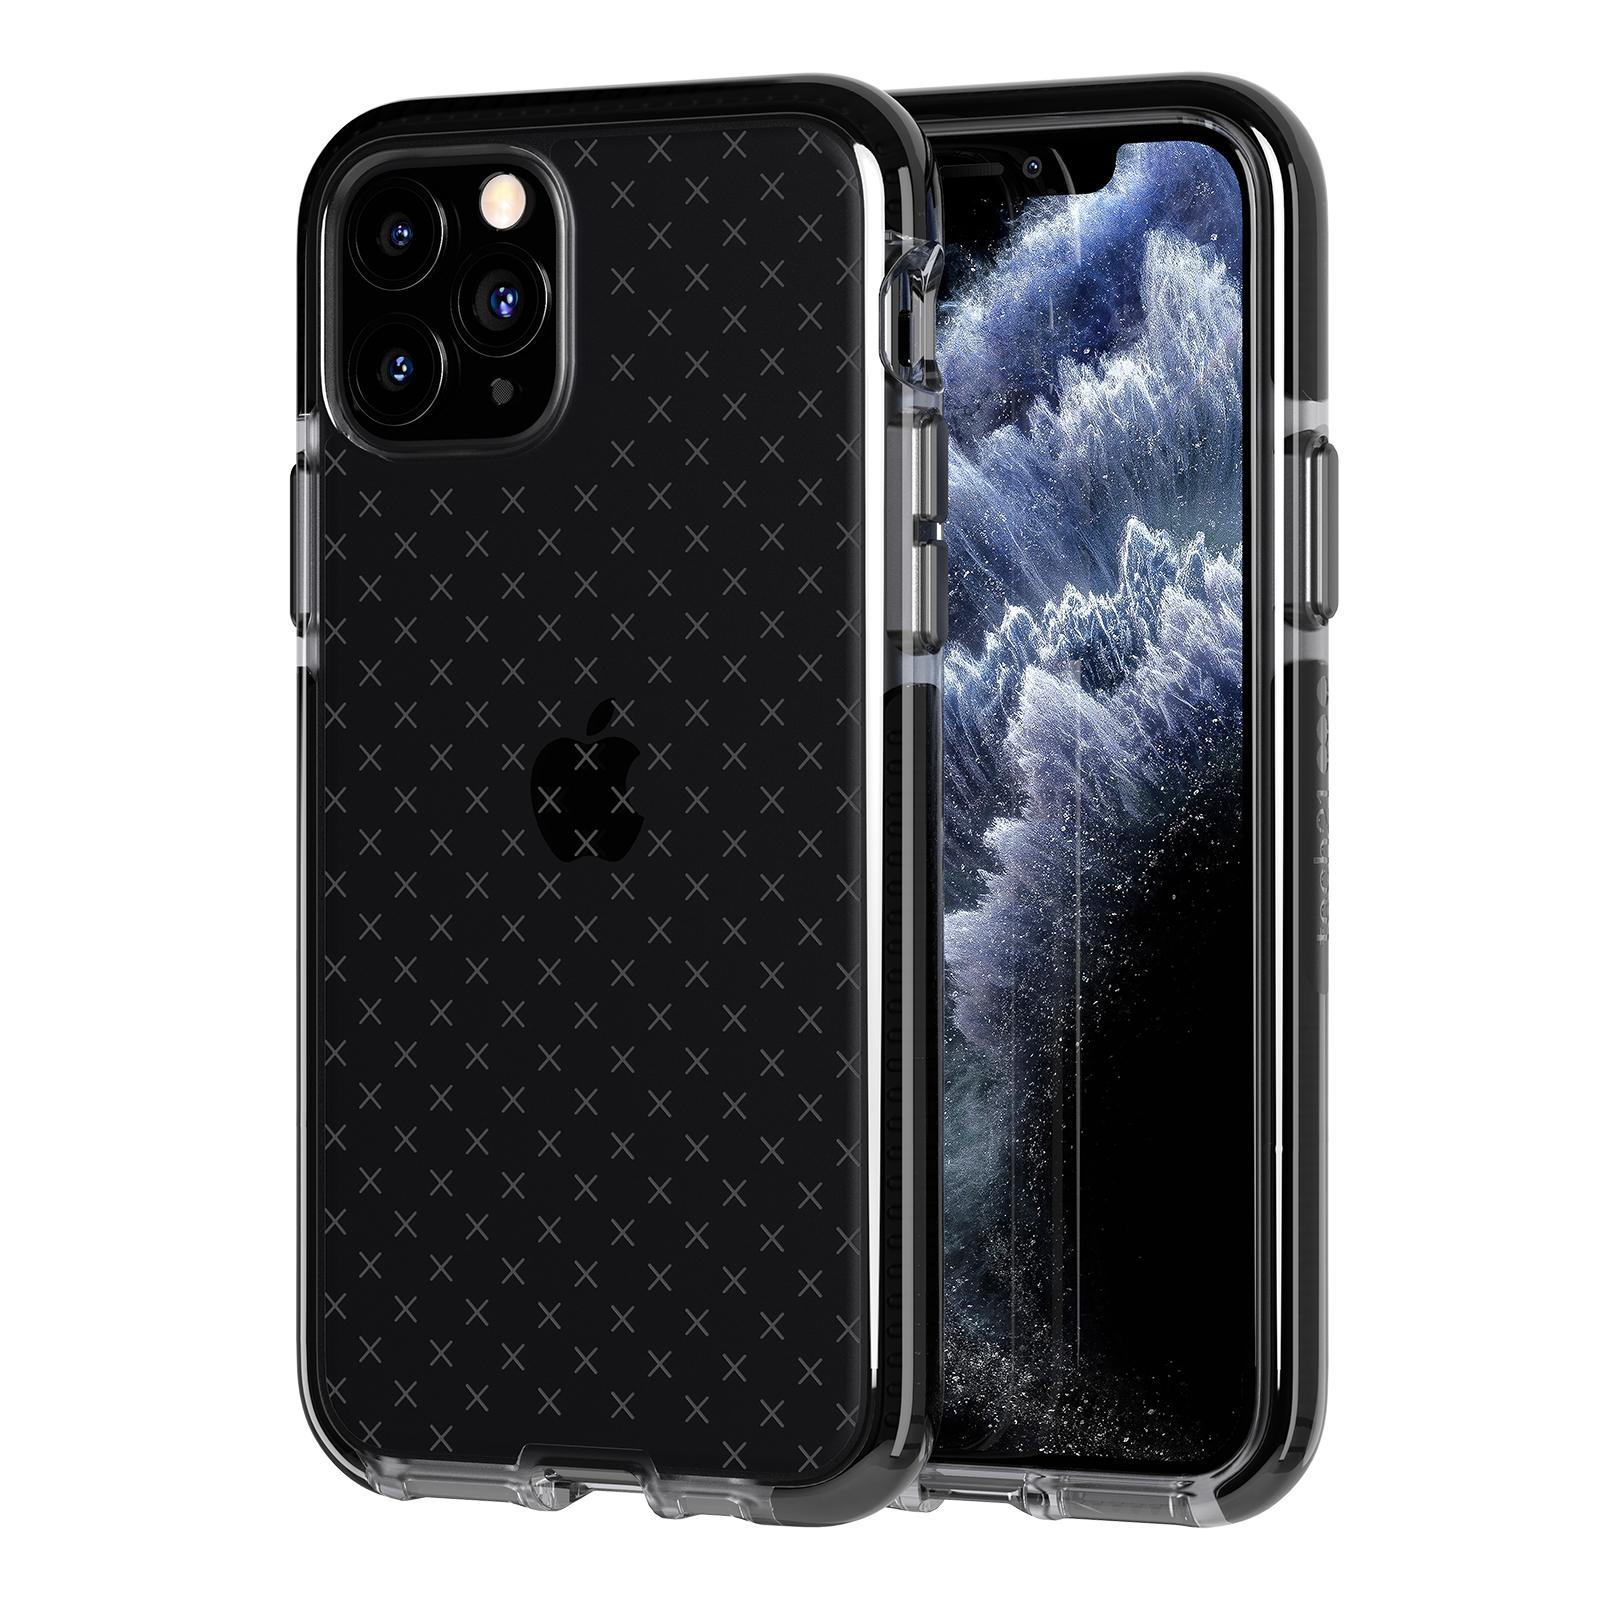 Evo Check Case iPhone 11 Pro Smokey Black